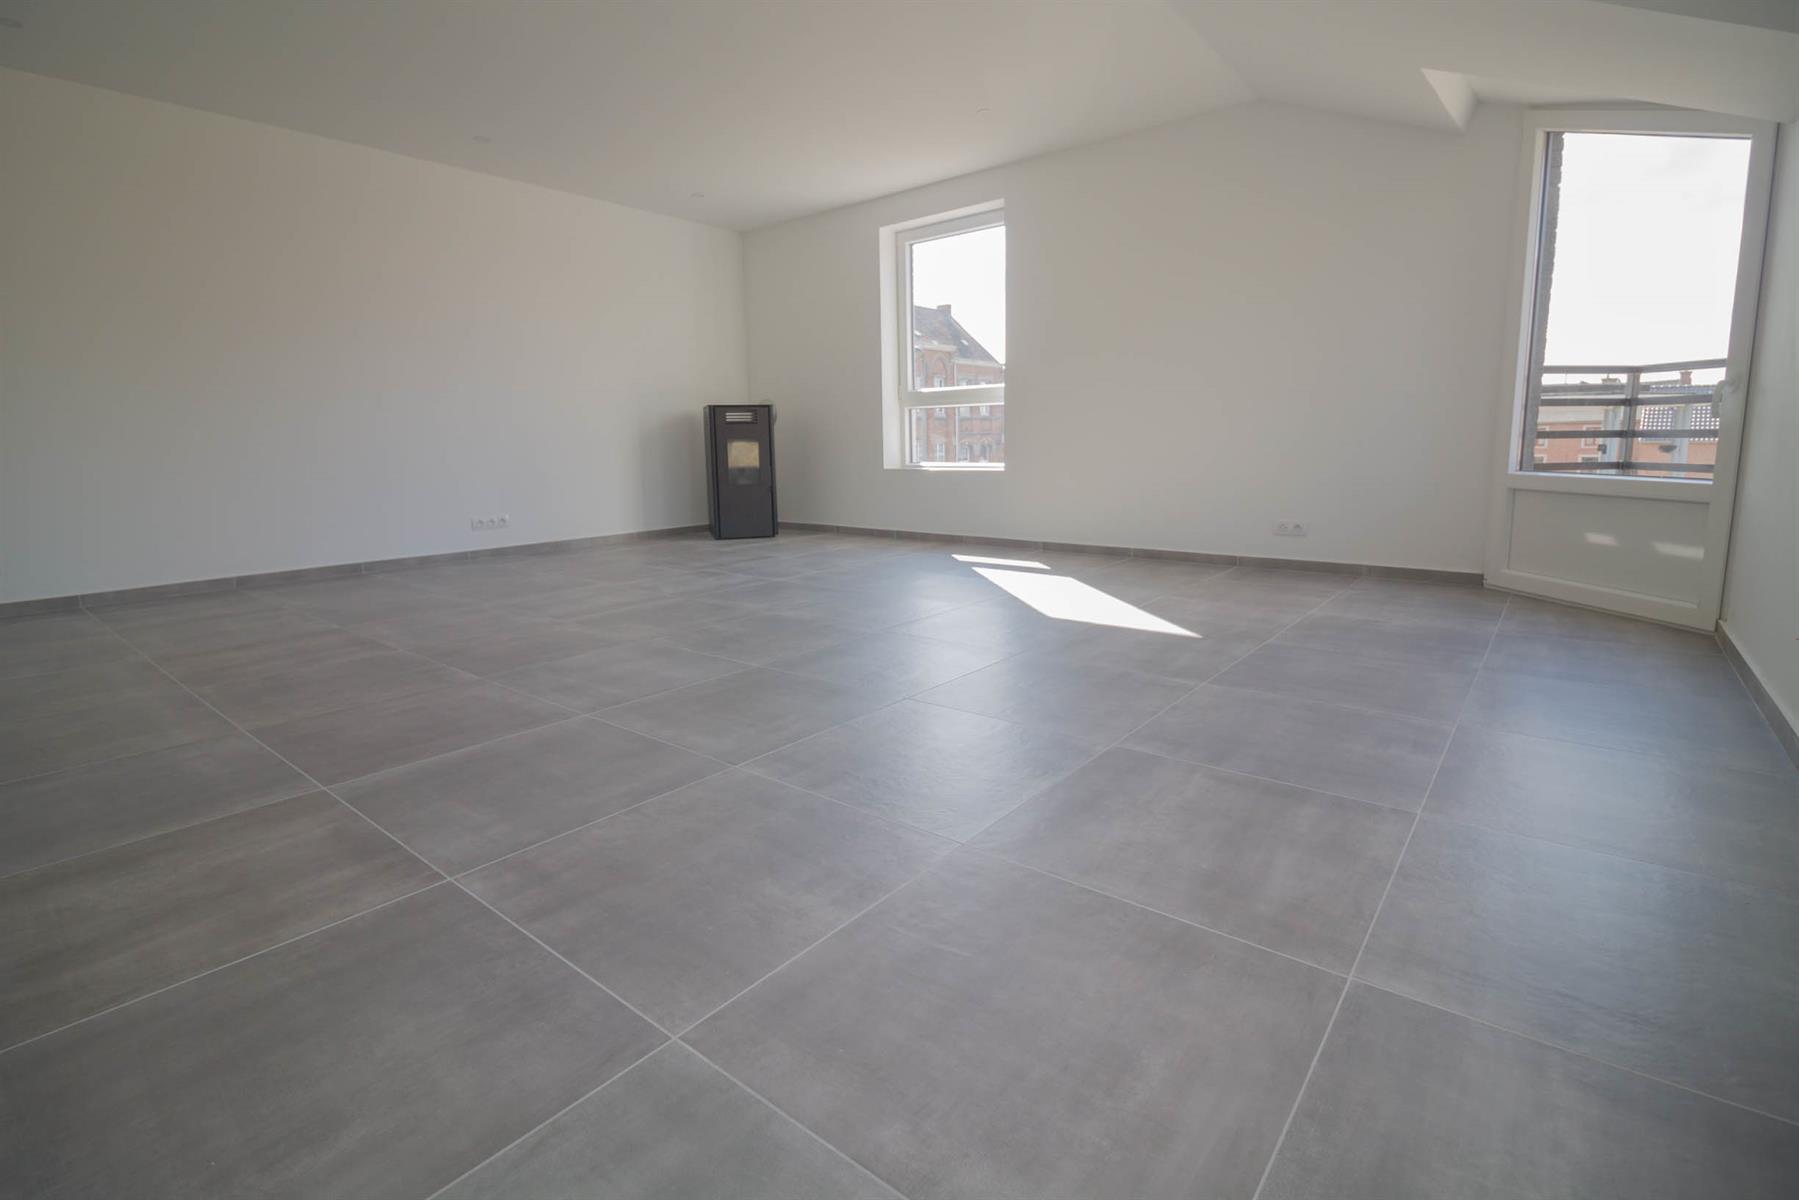 Appartement - Peissant - #4321179-5